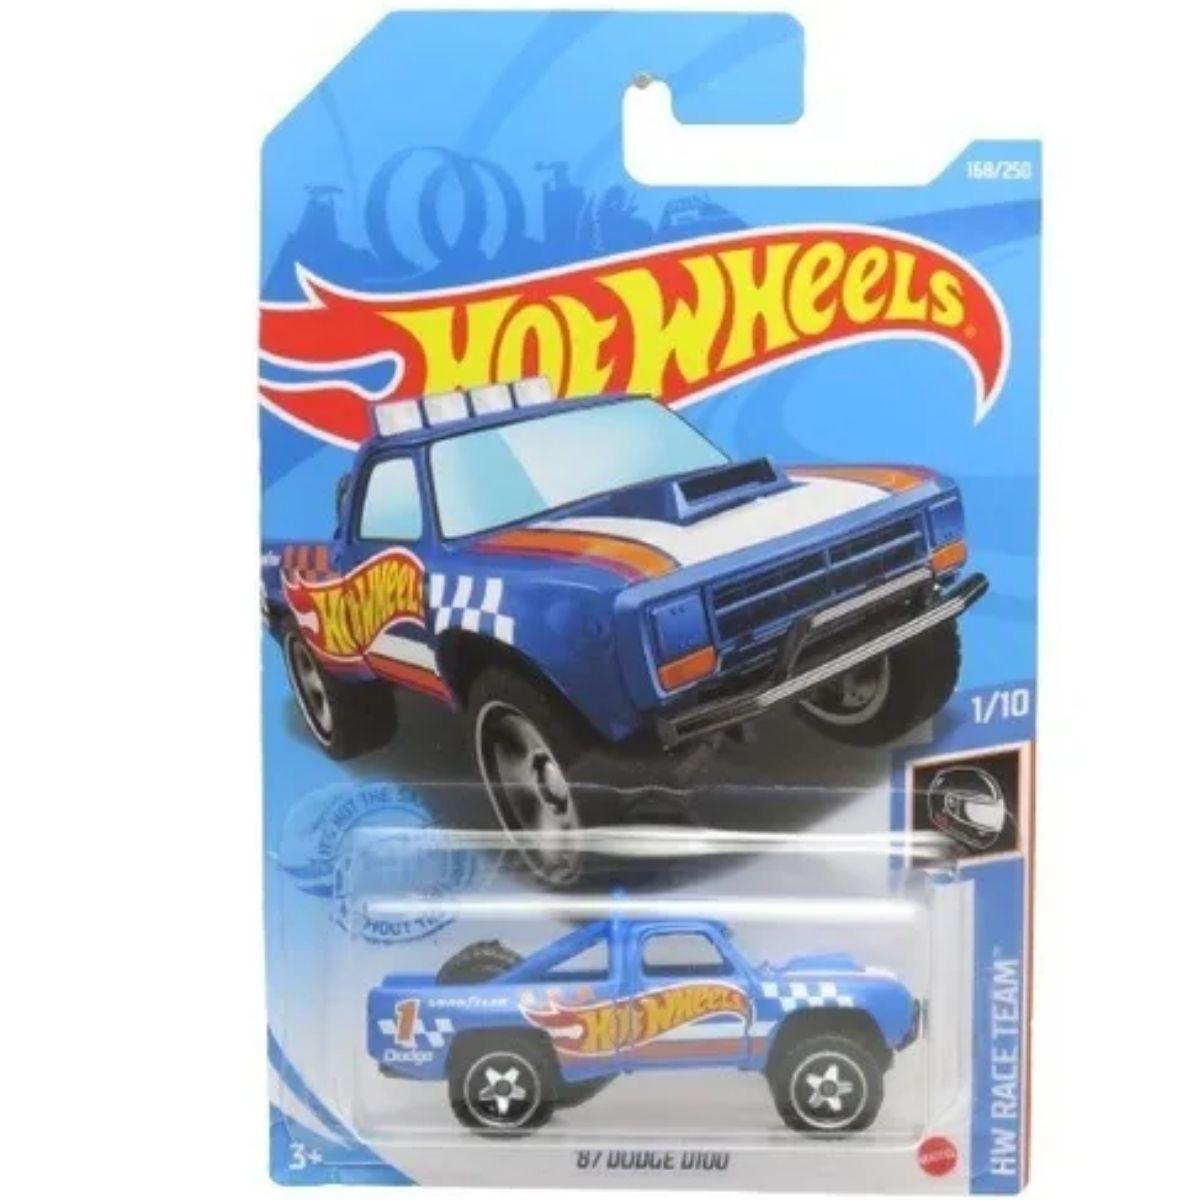 Carrinho Hot Wheels 87 Dodge D100 168/250